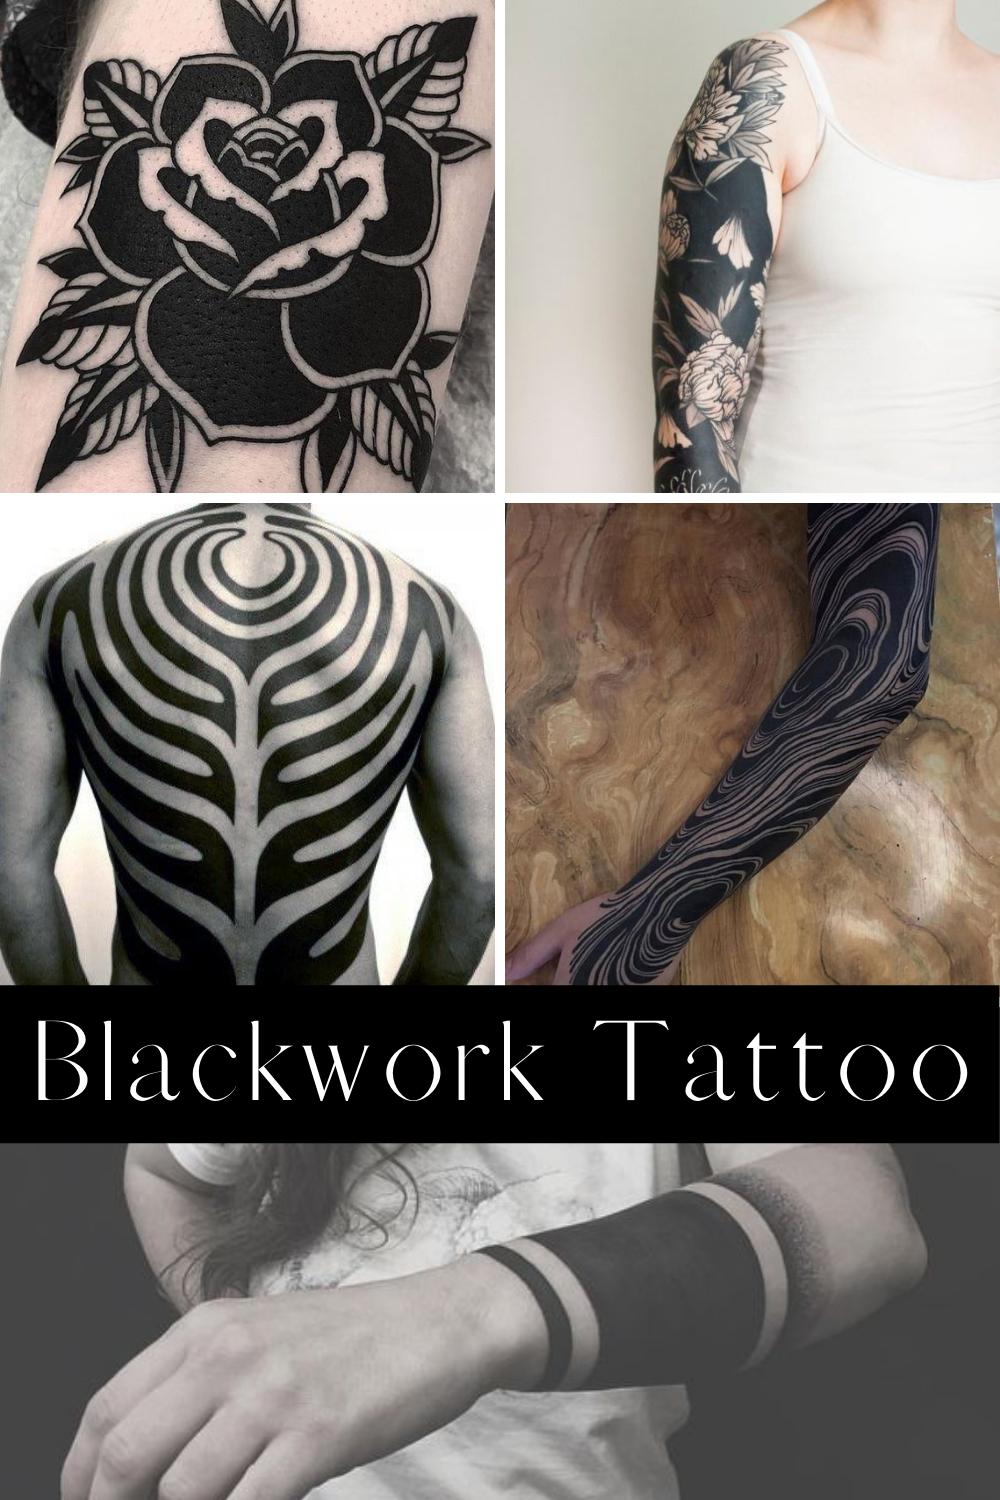 Blackwork Tattoo Ideas & Designs